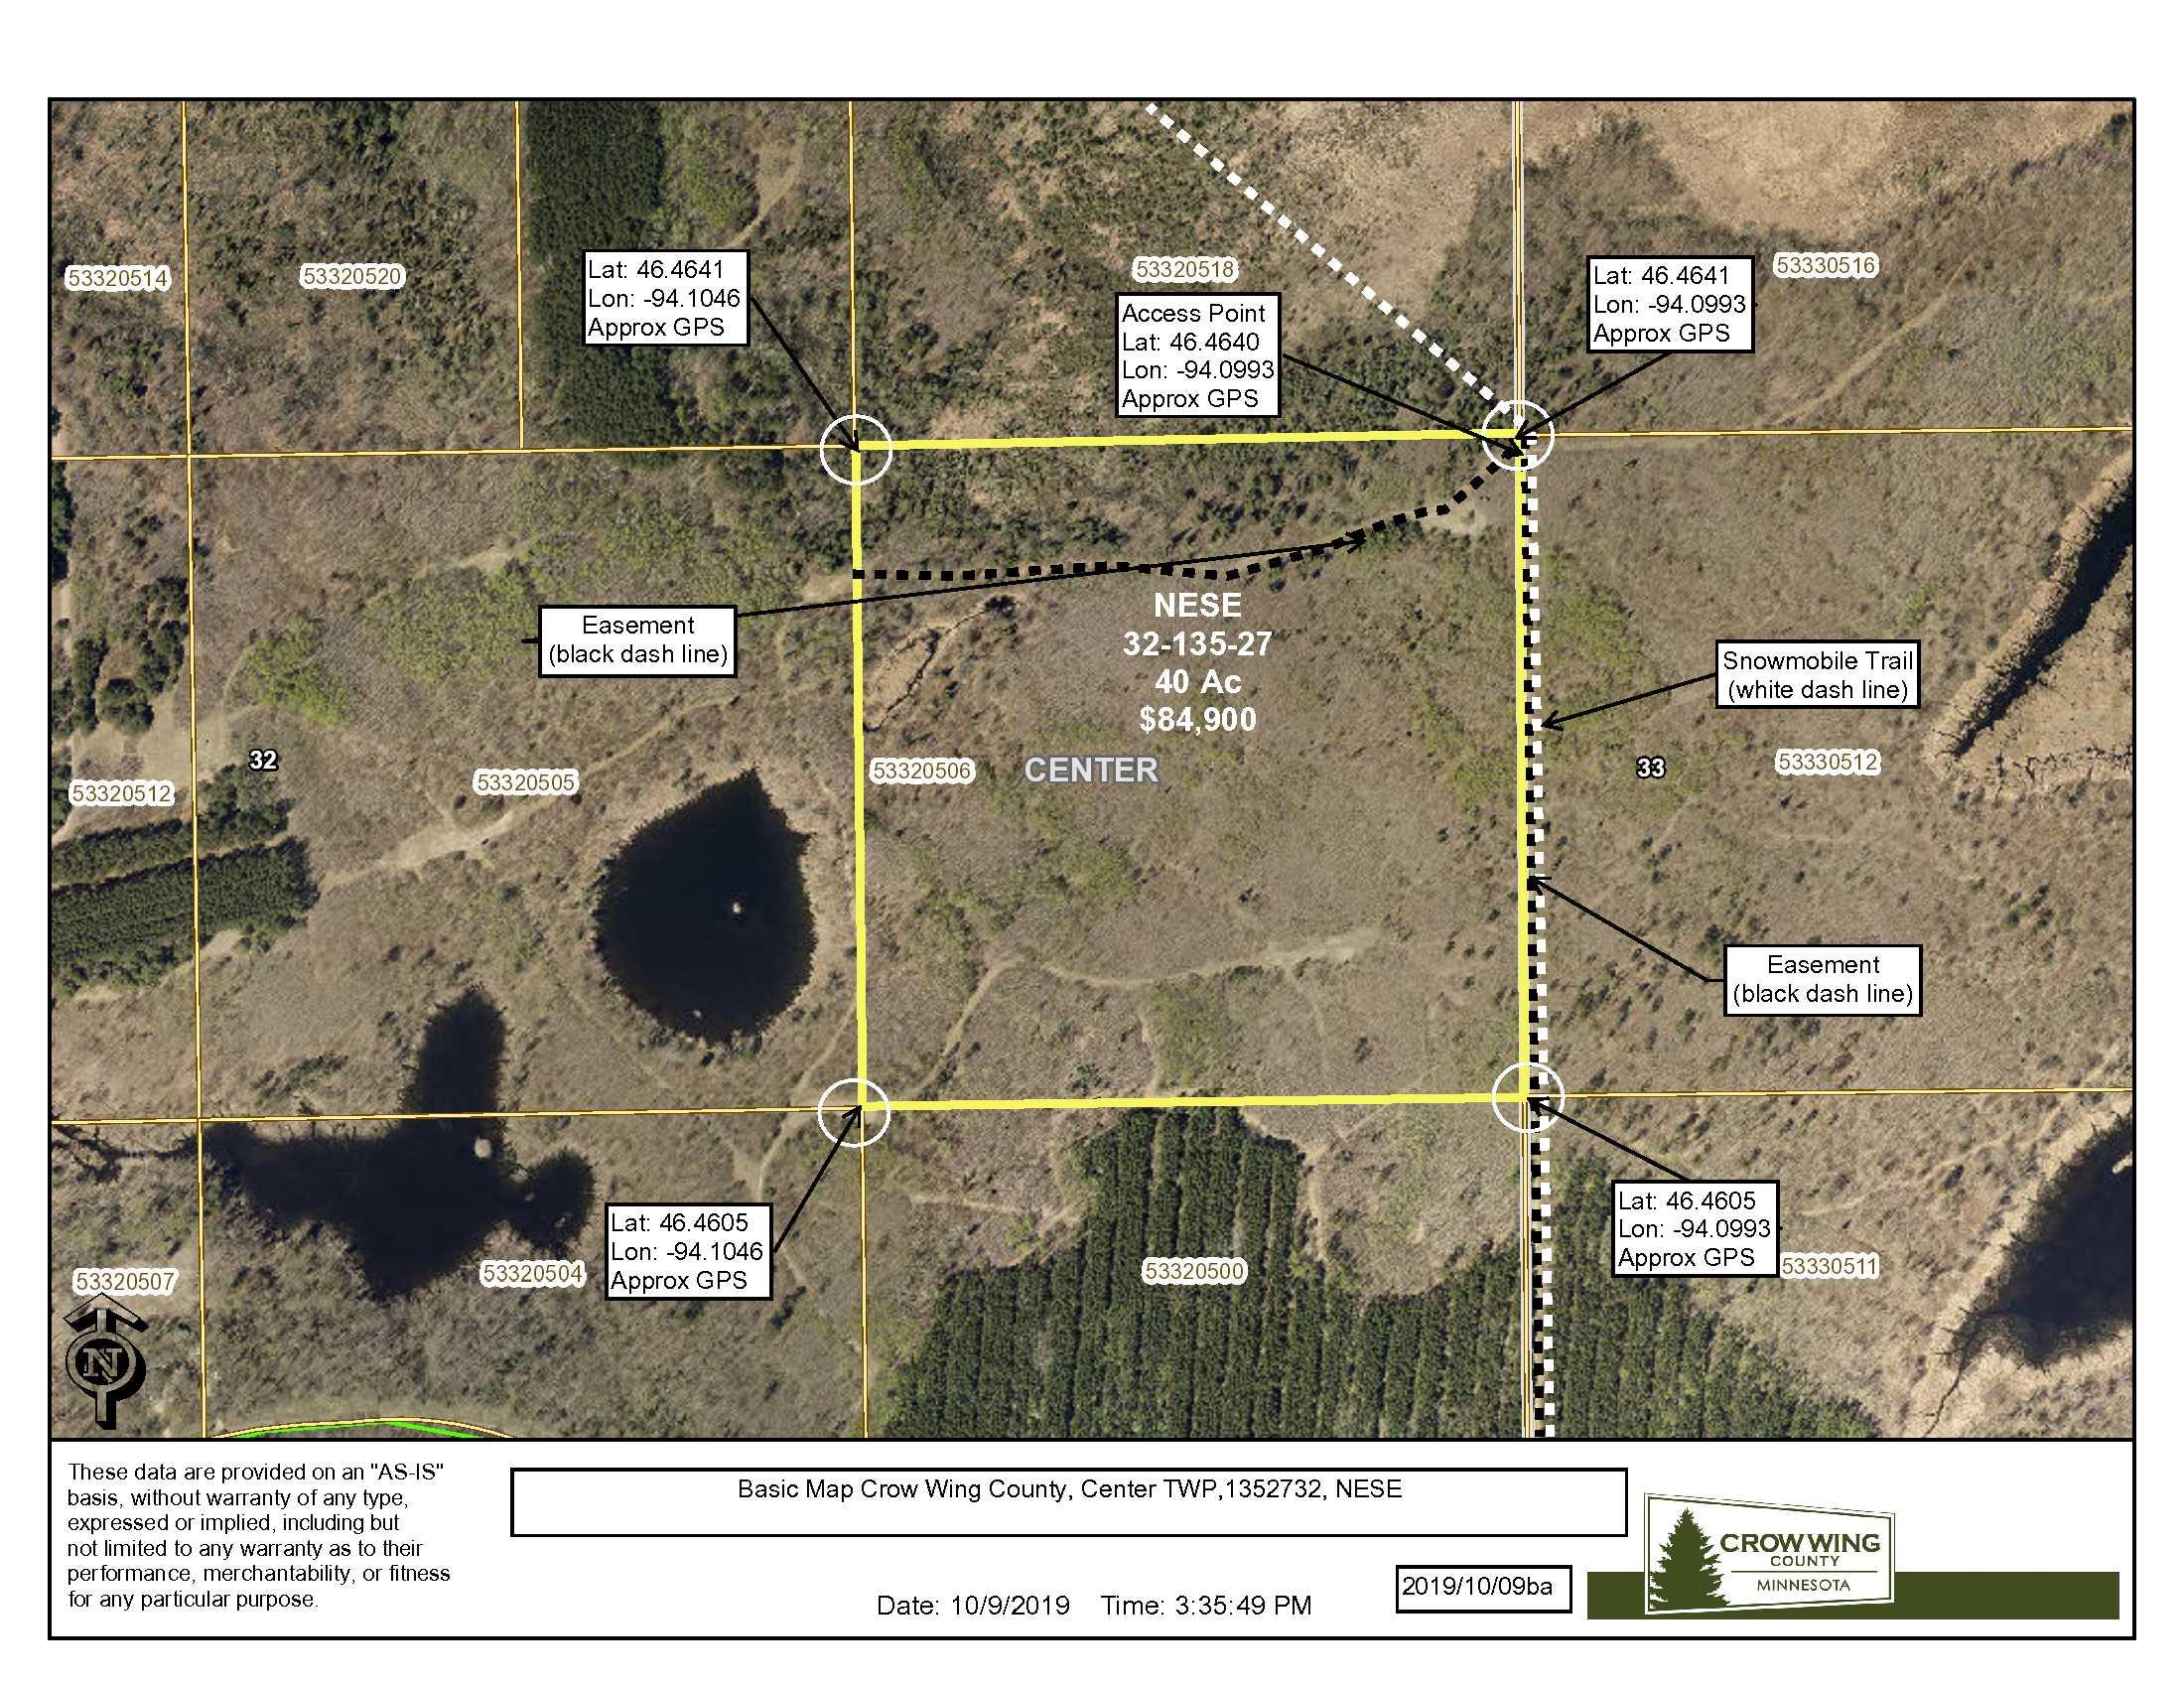 NESE, Sorenson Lake Rd ,Center Twp, Merrifield, Crow Wing County.